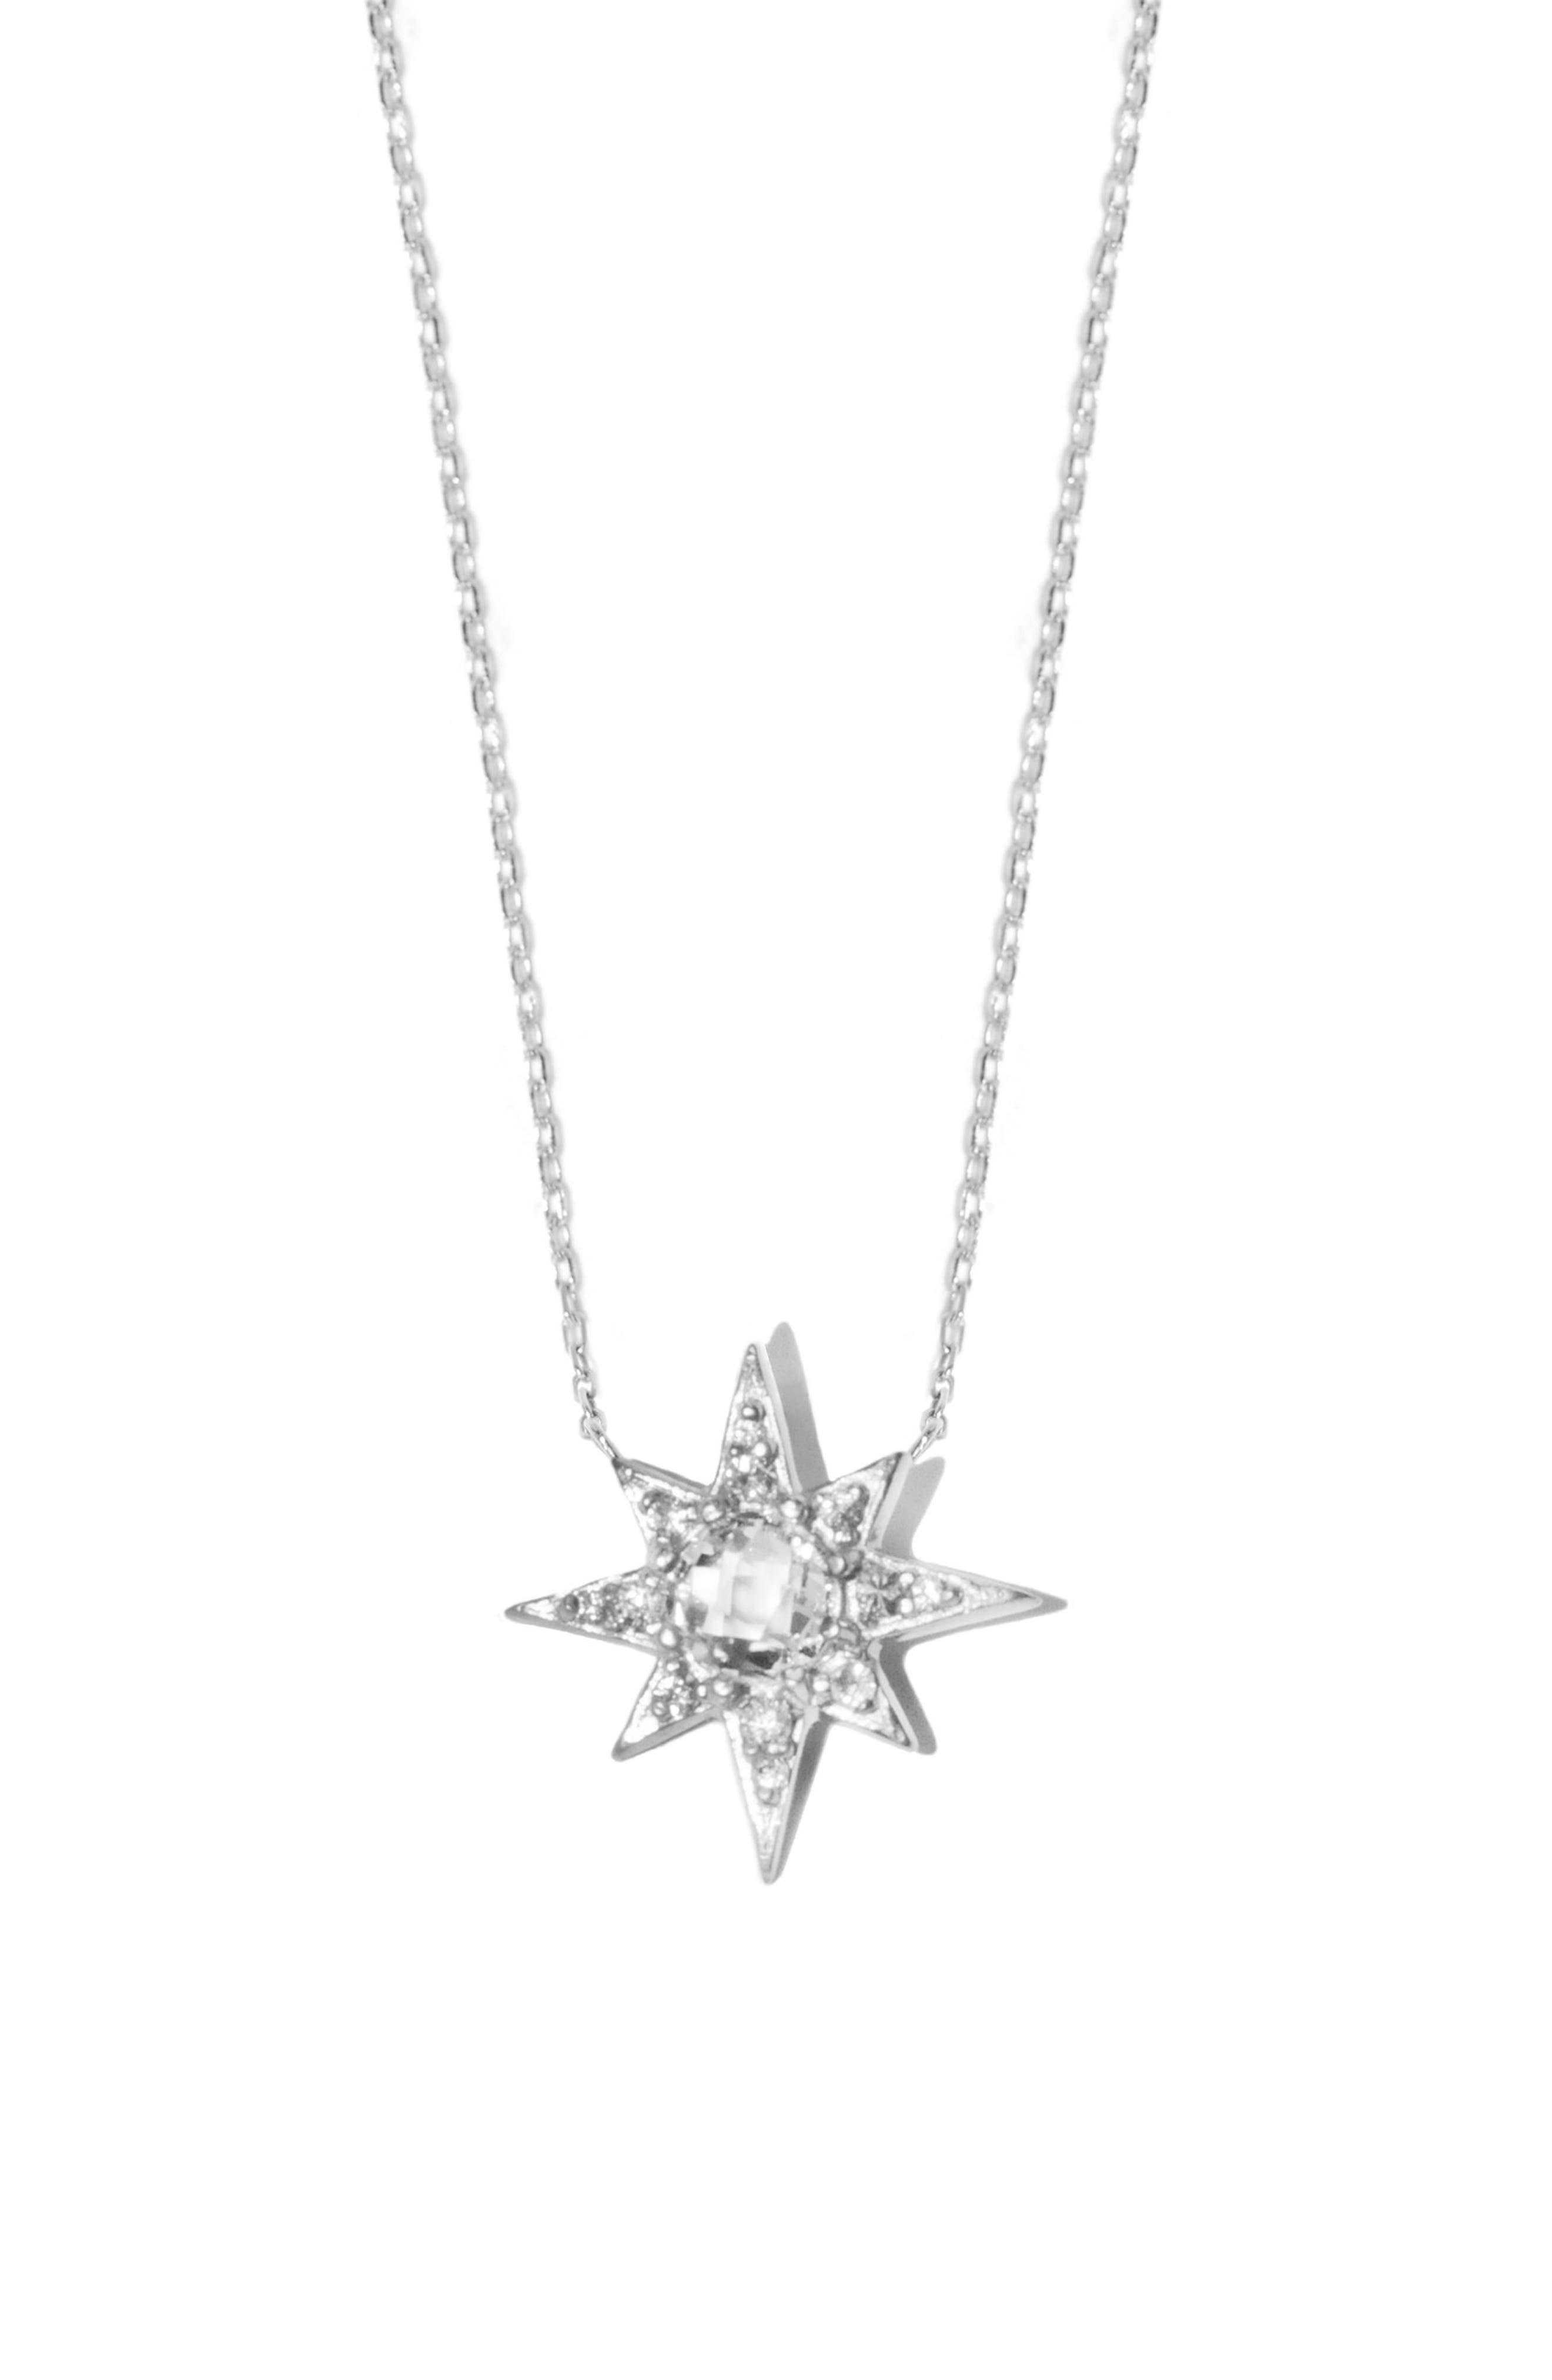 ANZIE, Starburst White Topaz Pendant Necklace, Main thumbnail 1, color, SILVER